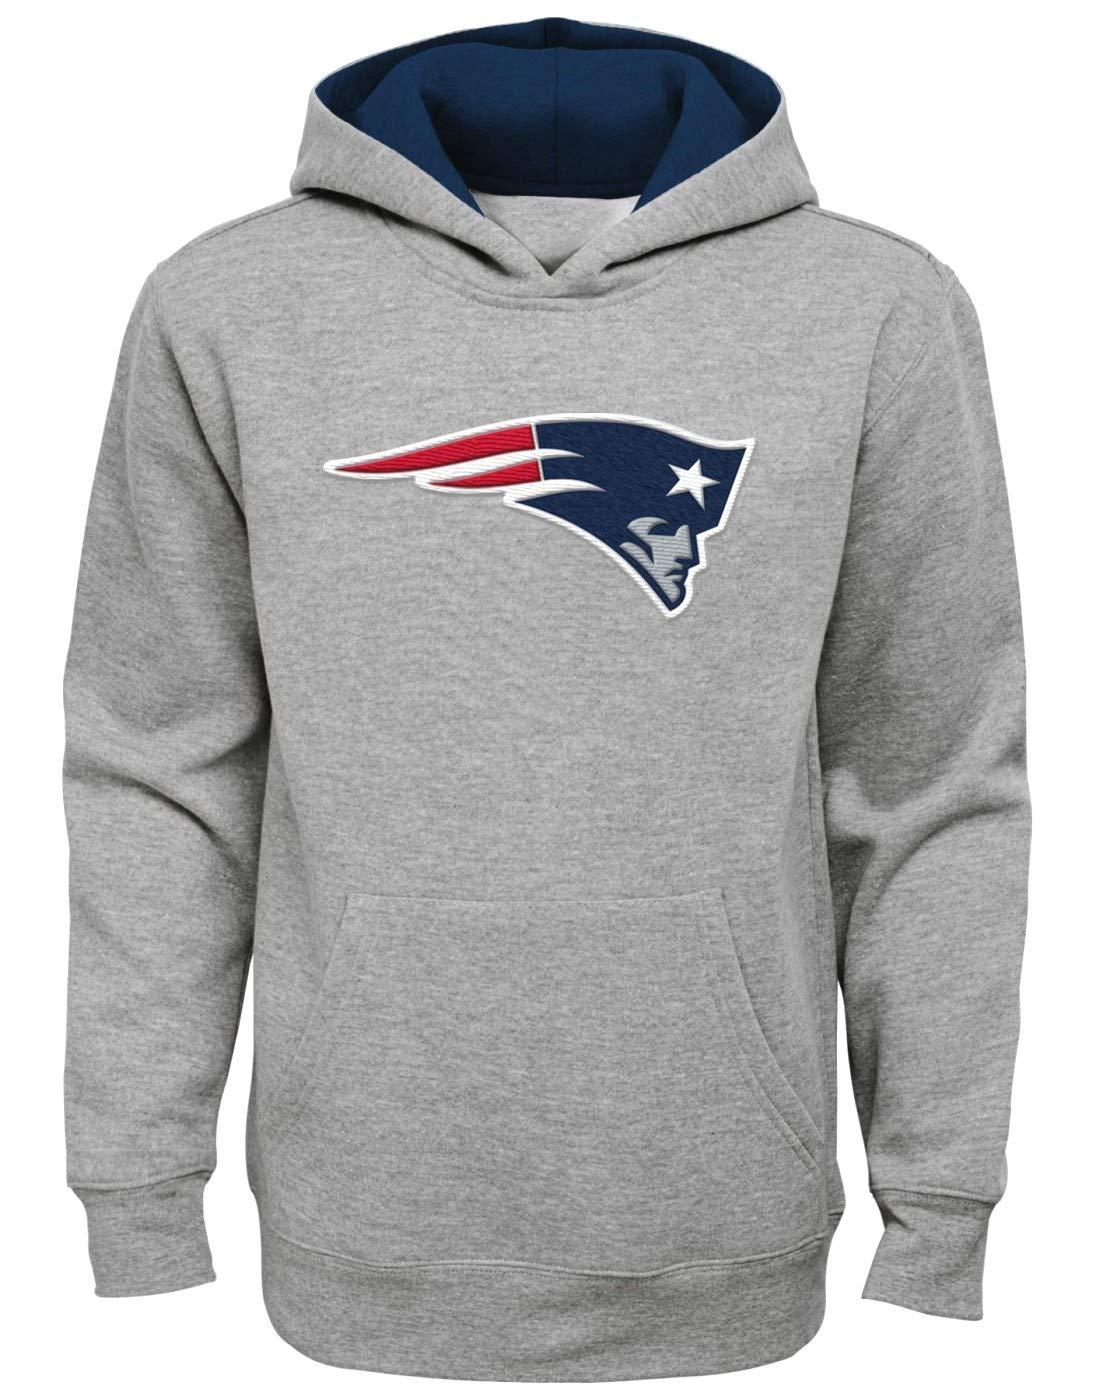 Outerstuff ニューイングランドペイトリオッツ ユース NFL プライムタイム プルオーバー フード付きスウェットシャツ - グレー Small (8)  B07FN5Q19P